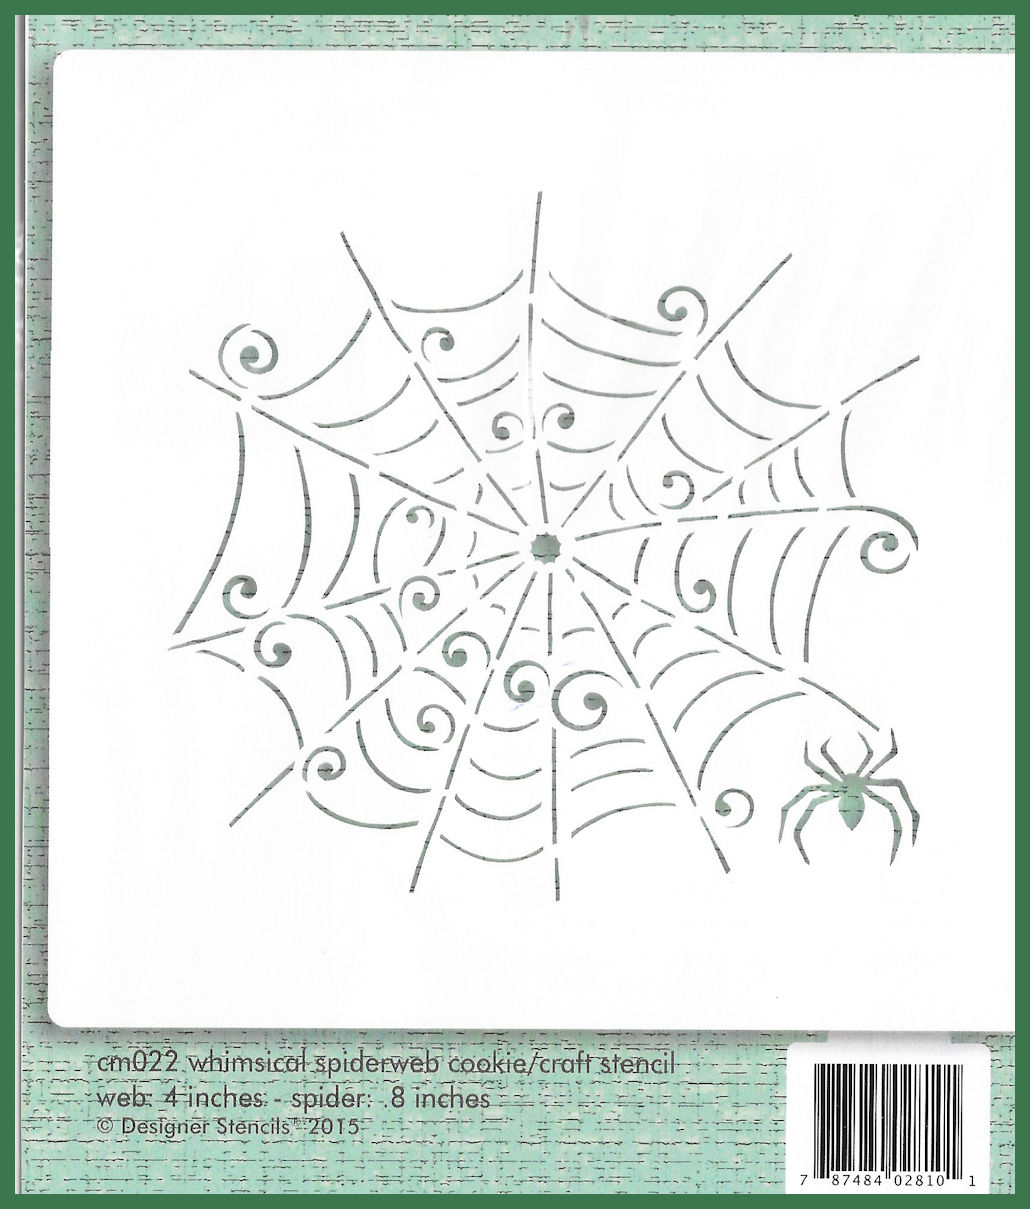 ds-whimsical-spiderweb.jpg